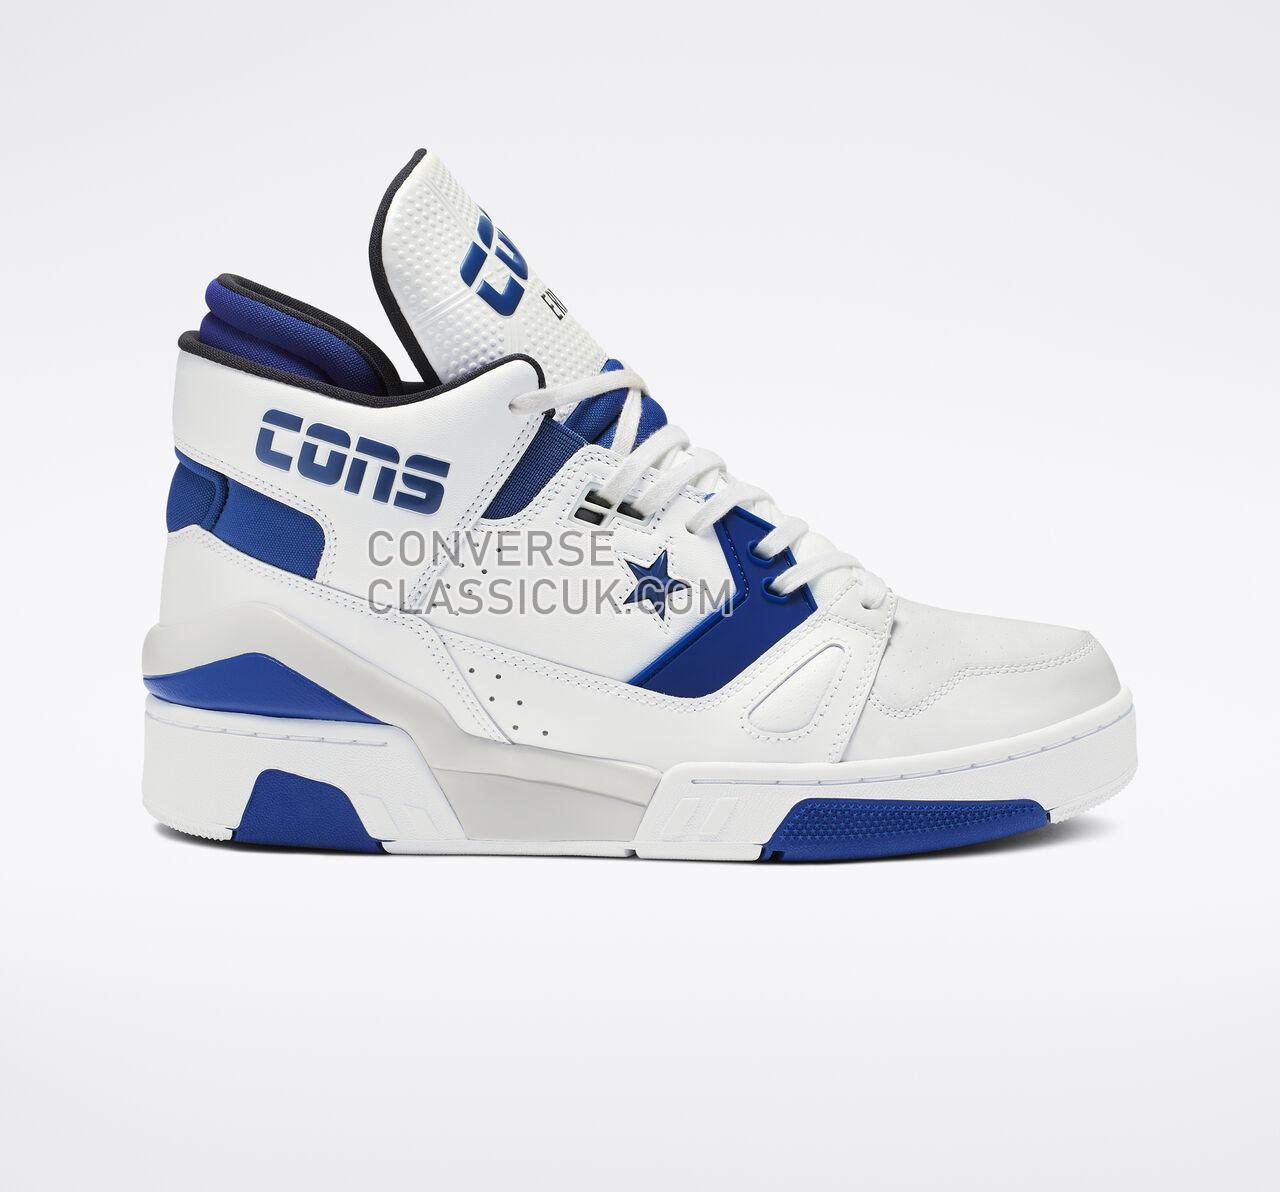 Converse ERX 260 Mid Mens Womens Unisex 163851C White/Blue/Mason Shoes